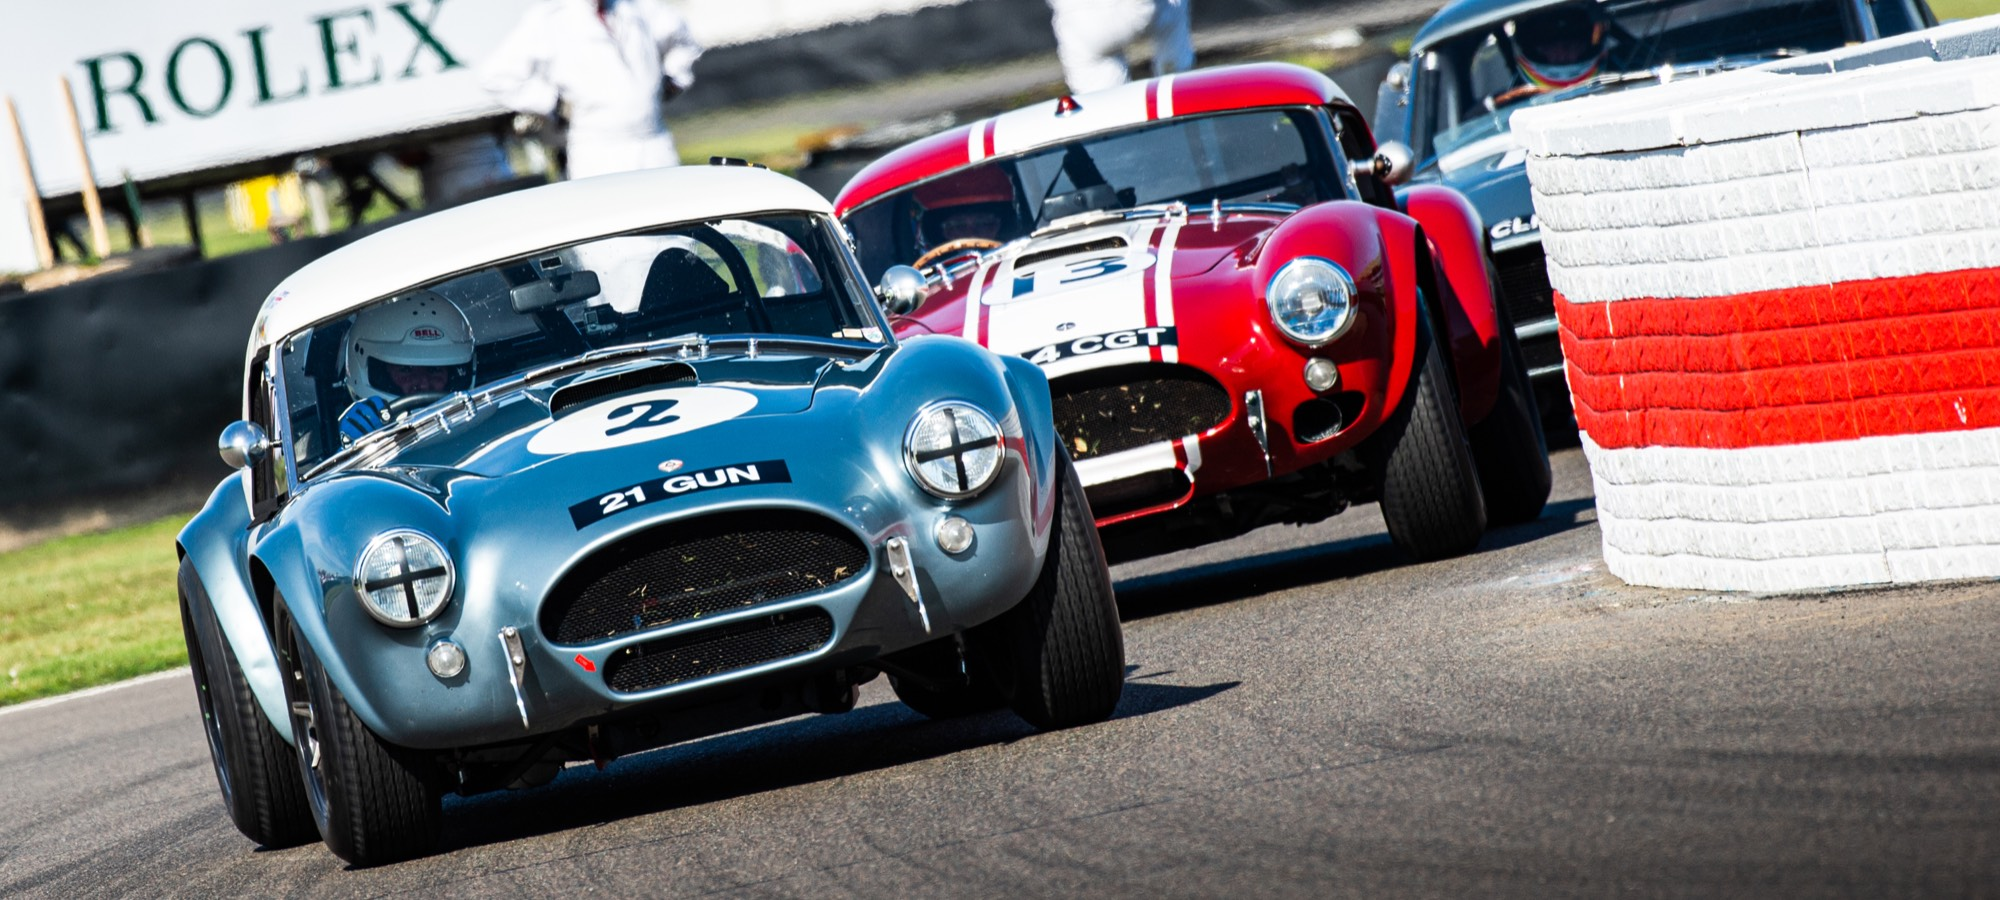 The 2019 RAC TT Winning, Goodwood Cobra Lap Record Holding 1965 AC Cobra Mk1 289